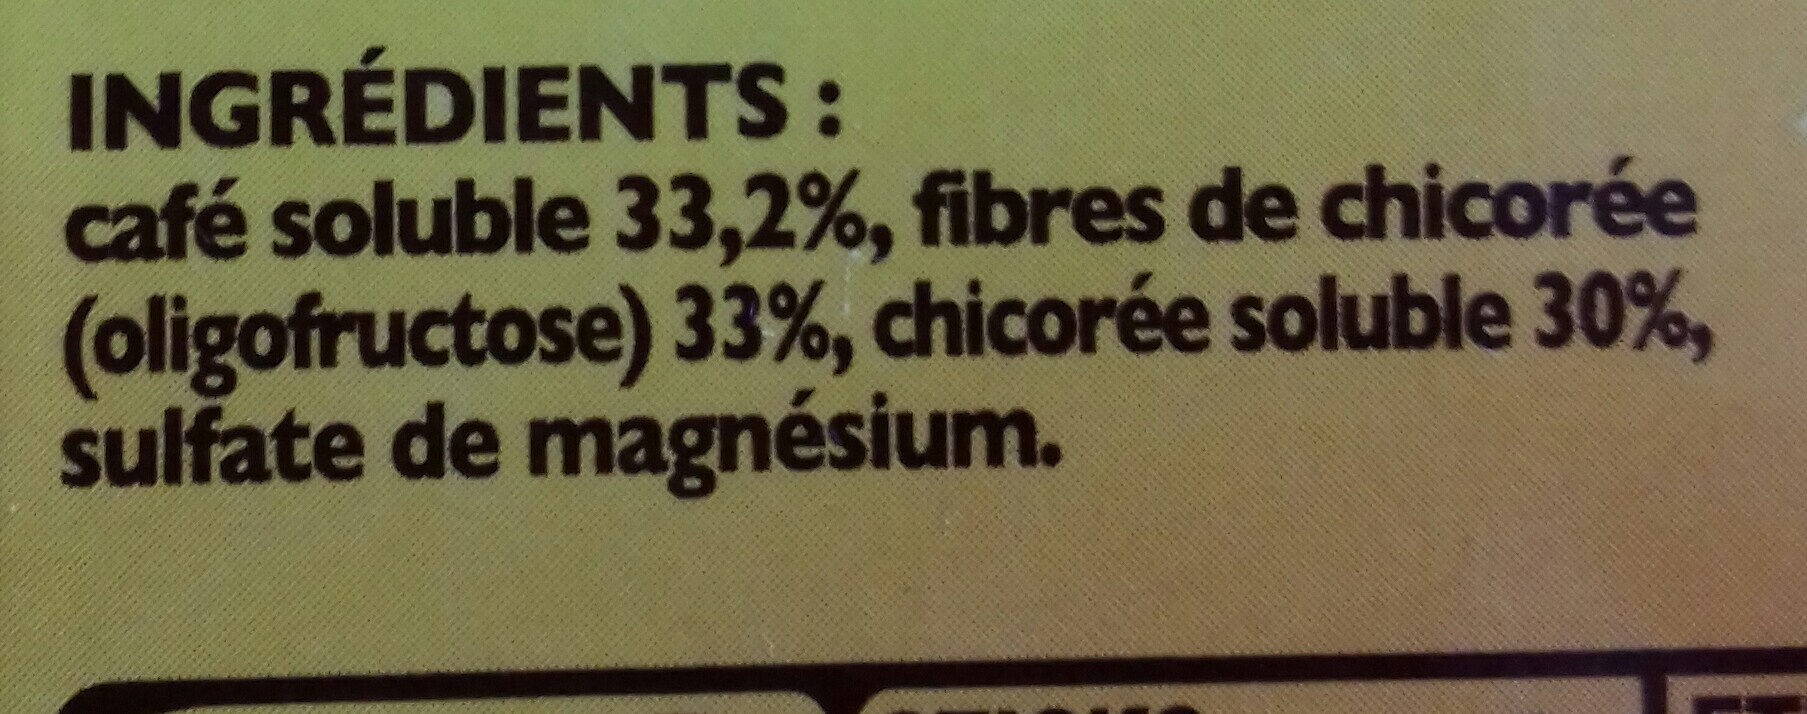 ricoré - Ingredients - fr